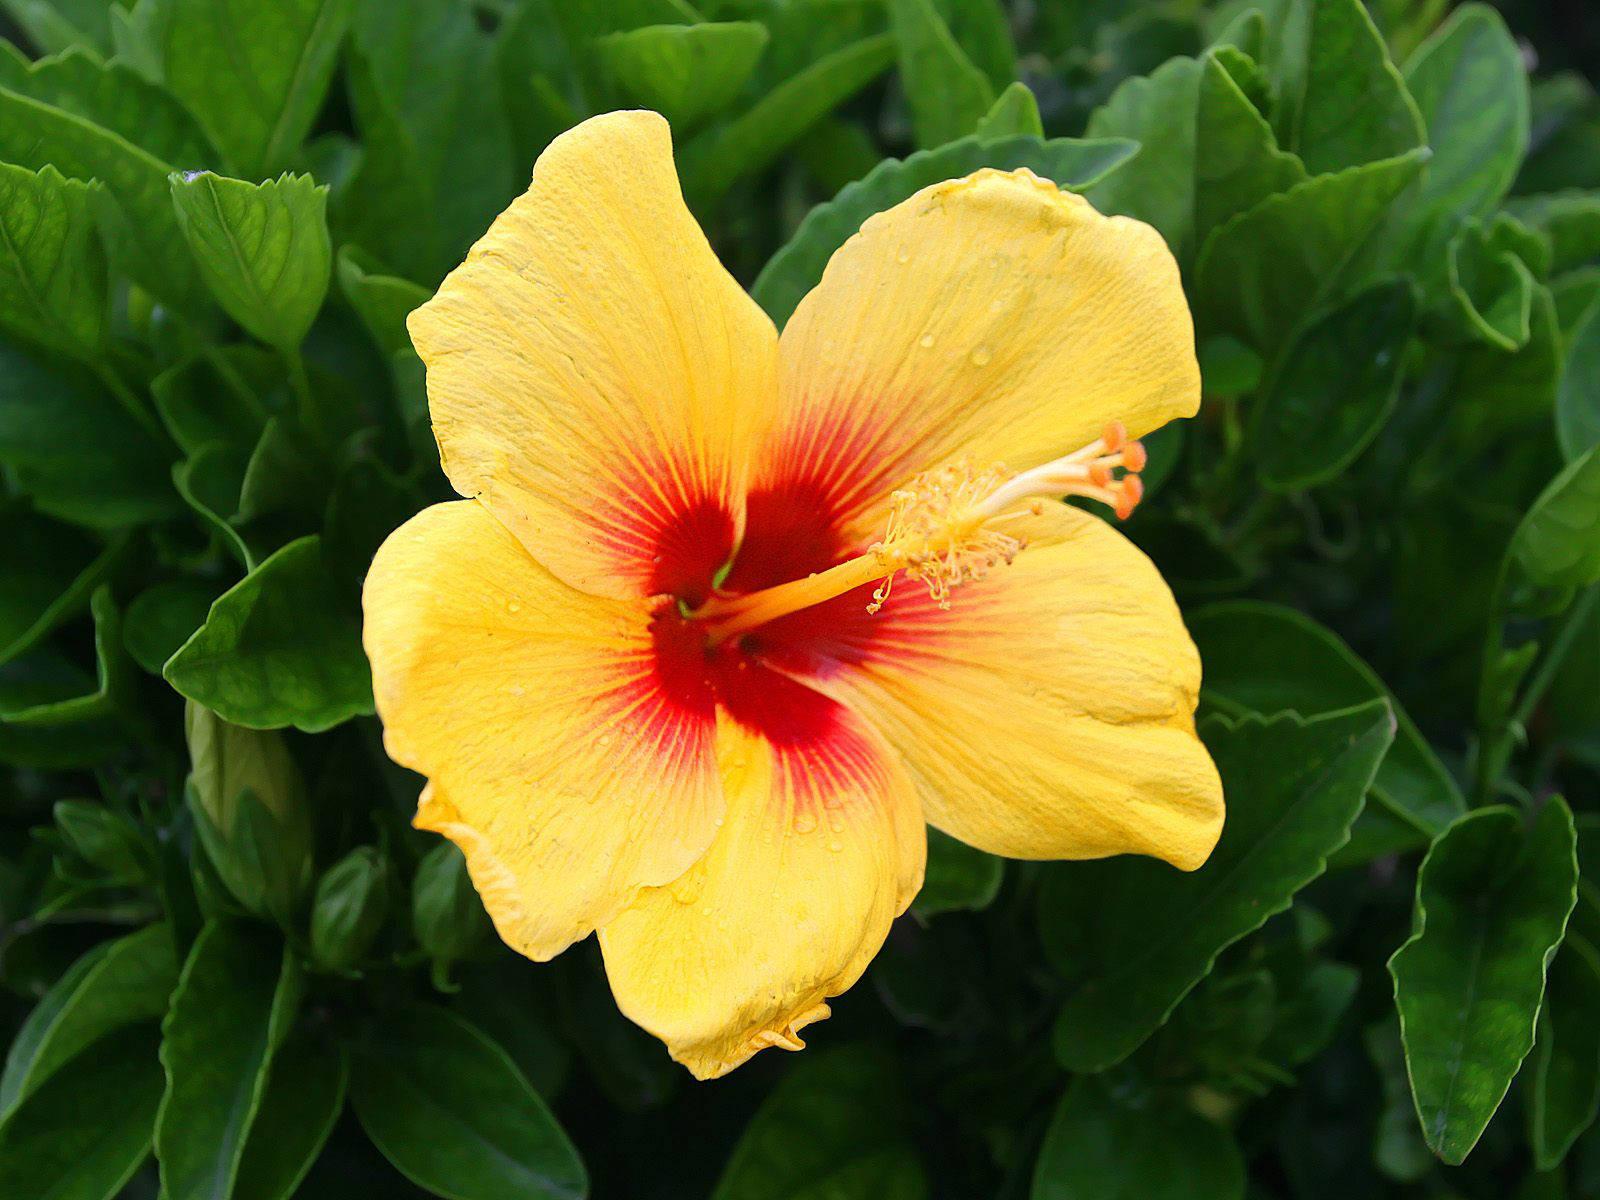 Flowering Shrubs And Vines Tropical 18 Hedge Maui 5 Plants